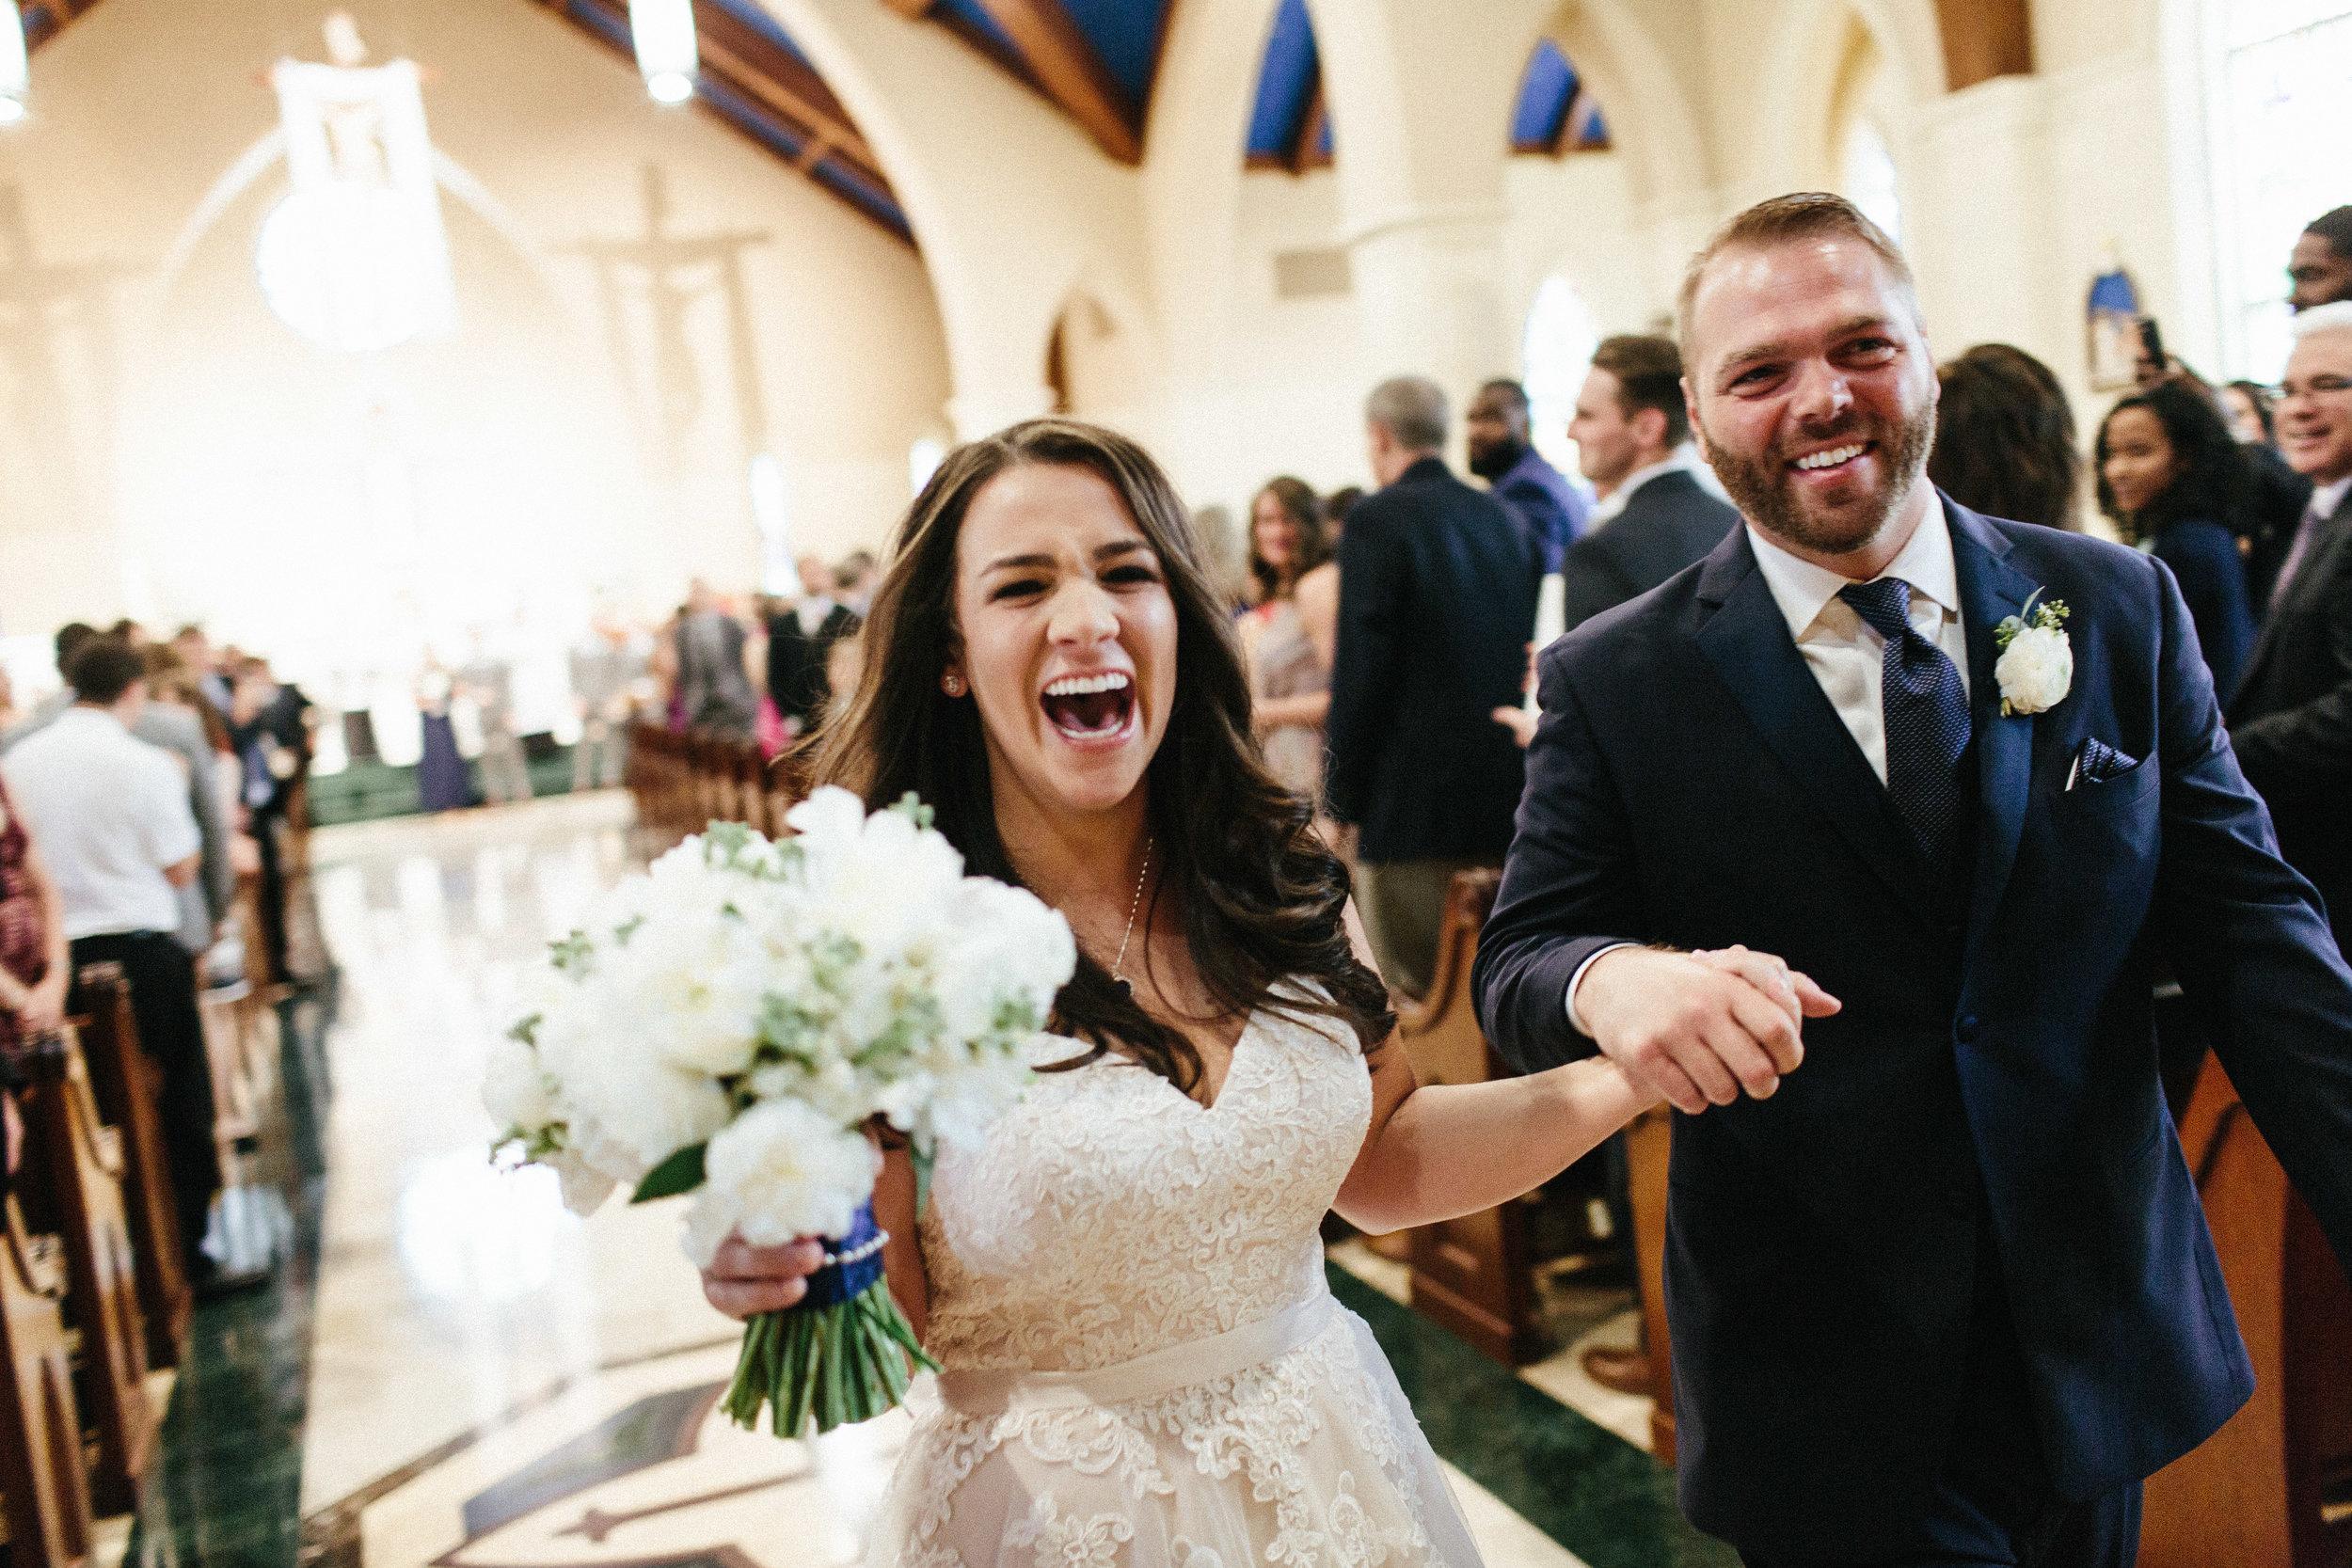 roswell_st_peter_chanel_catholic_avalon_hotel_alpharetta_wedding-1559.jpg